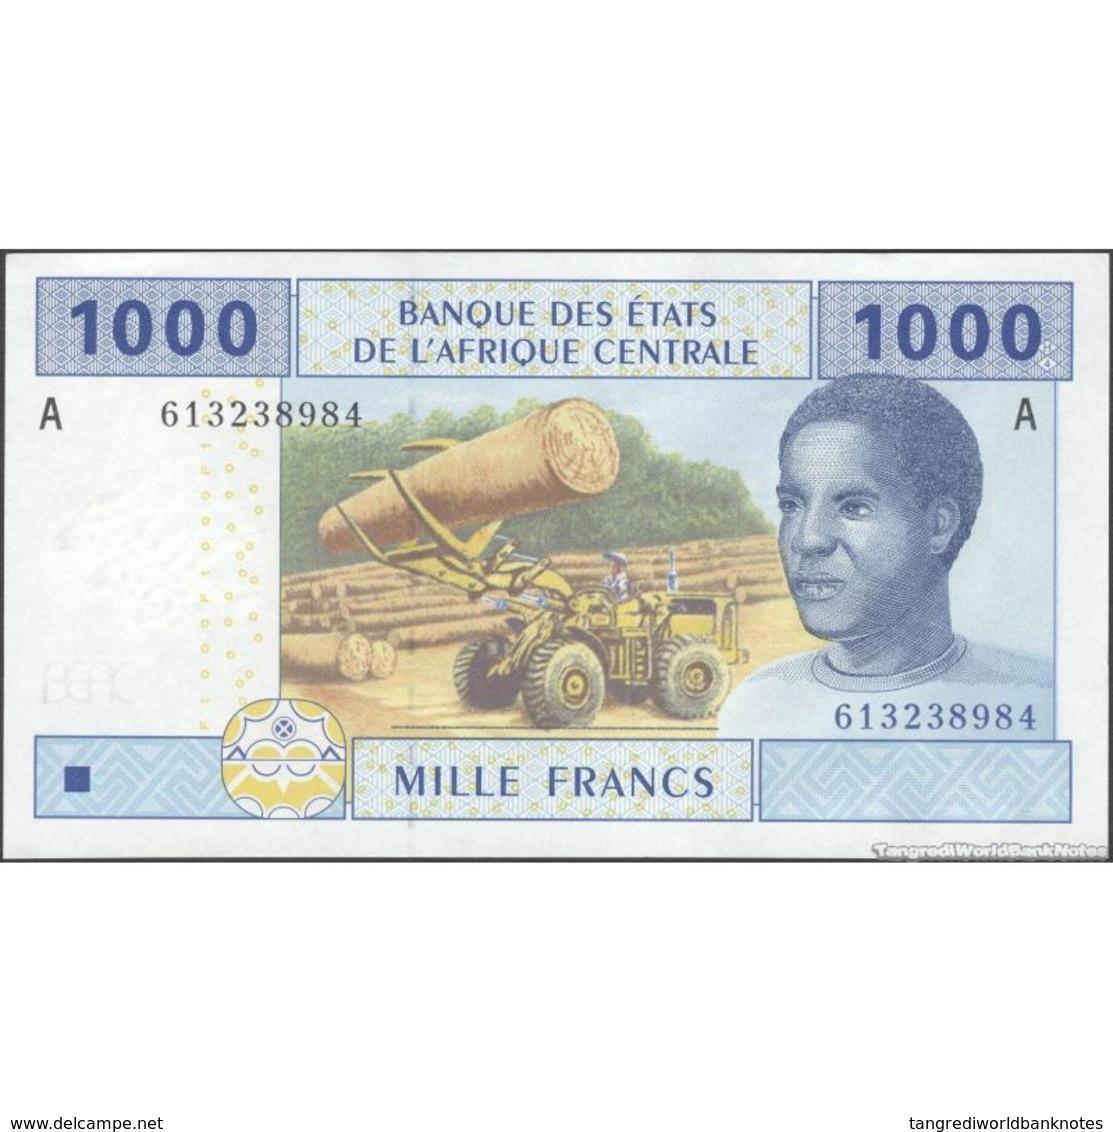 TWN - GABON (C.A.S.) 407Ac2 - 1000 1.000 Francs 2002 (2016) UNC - Gabon